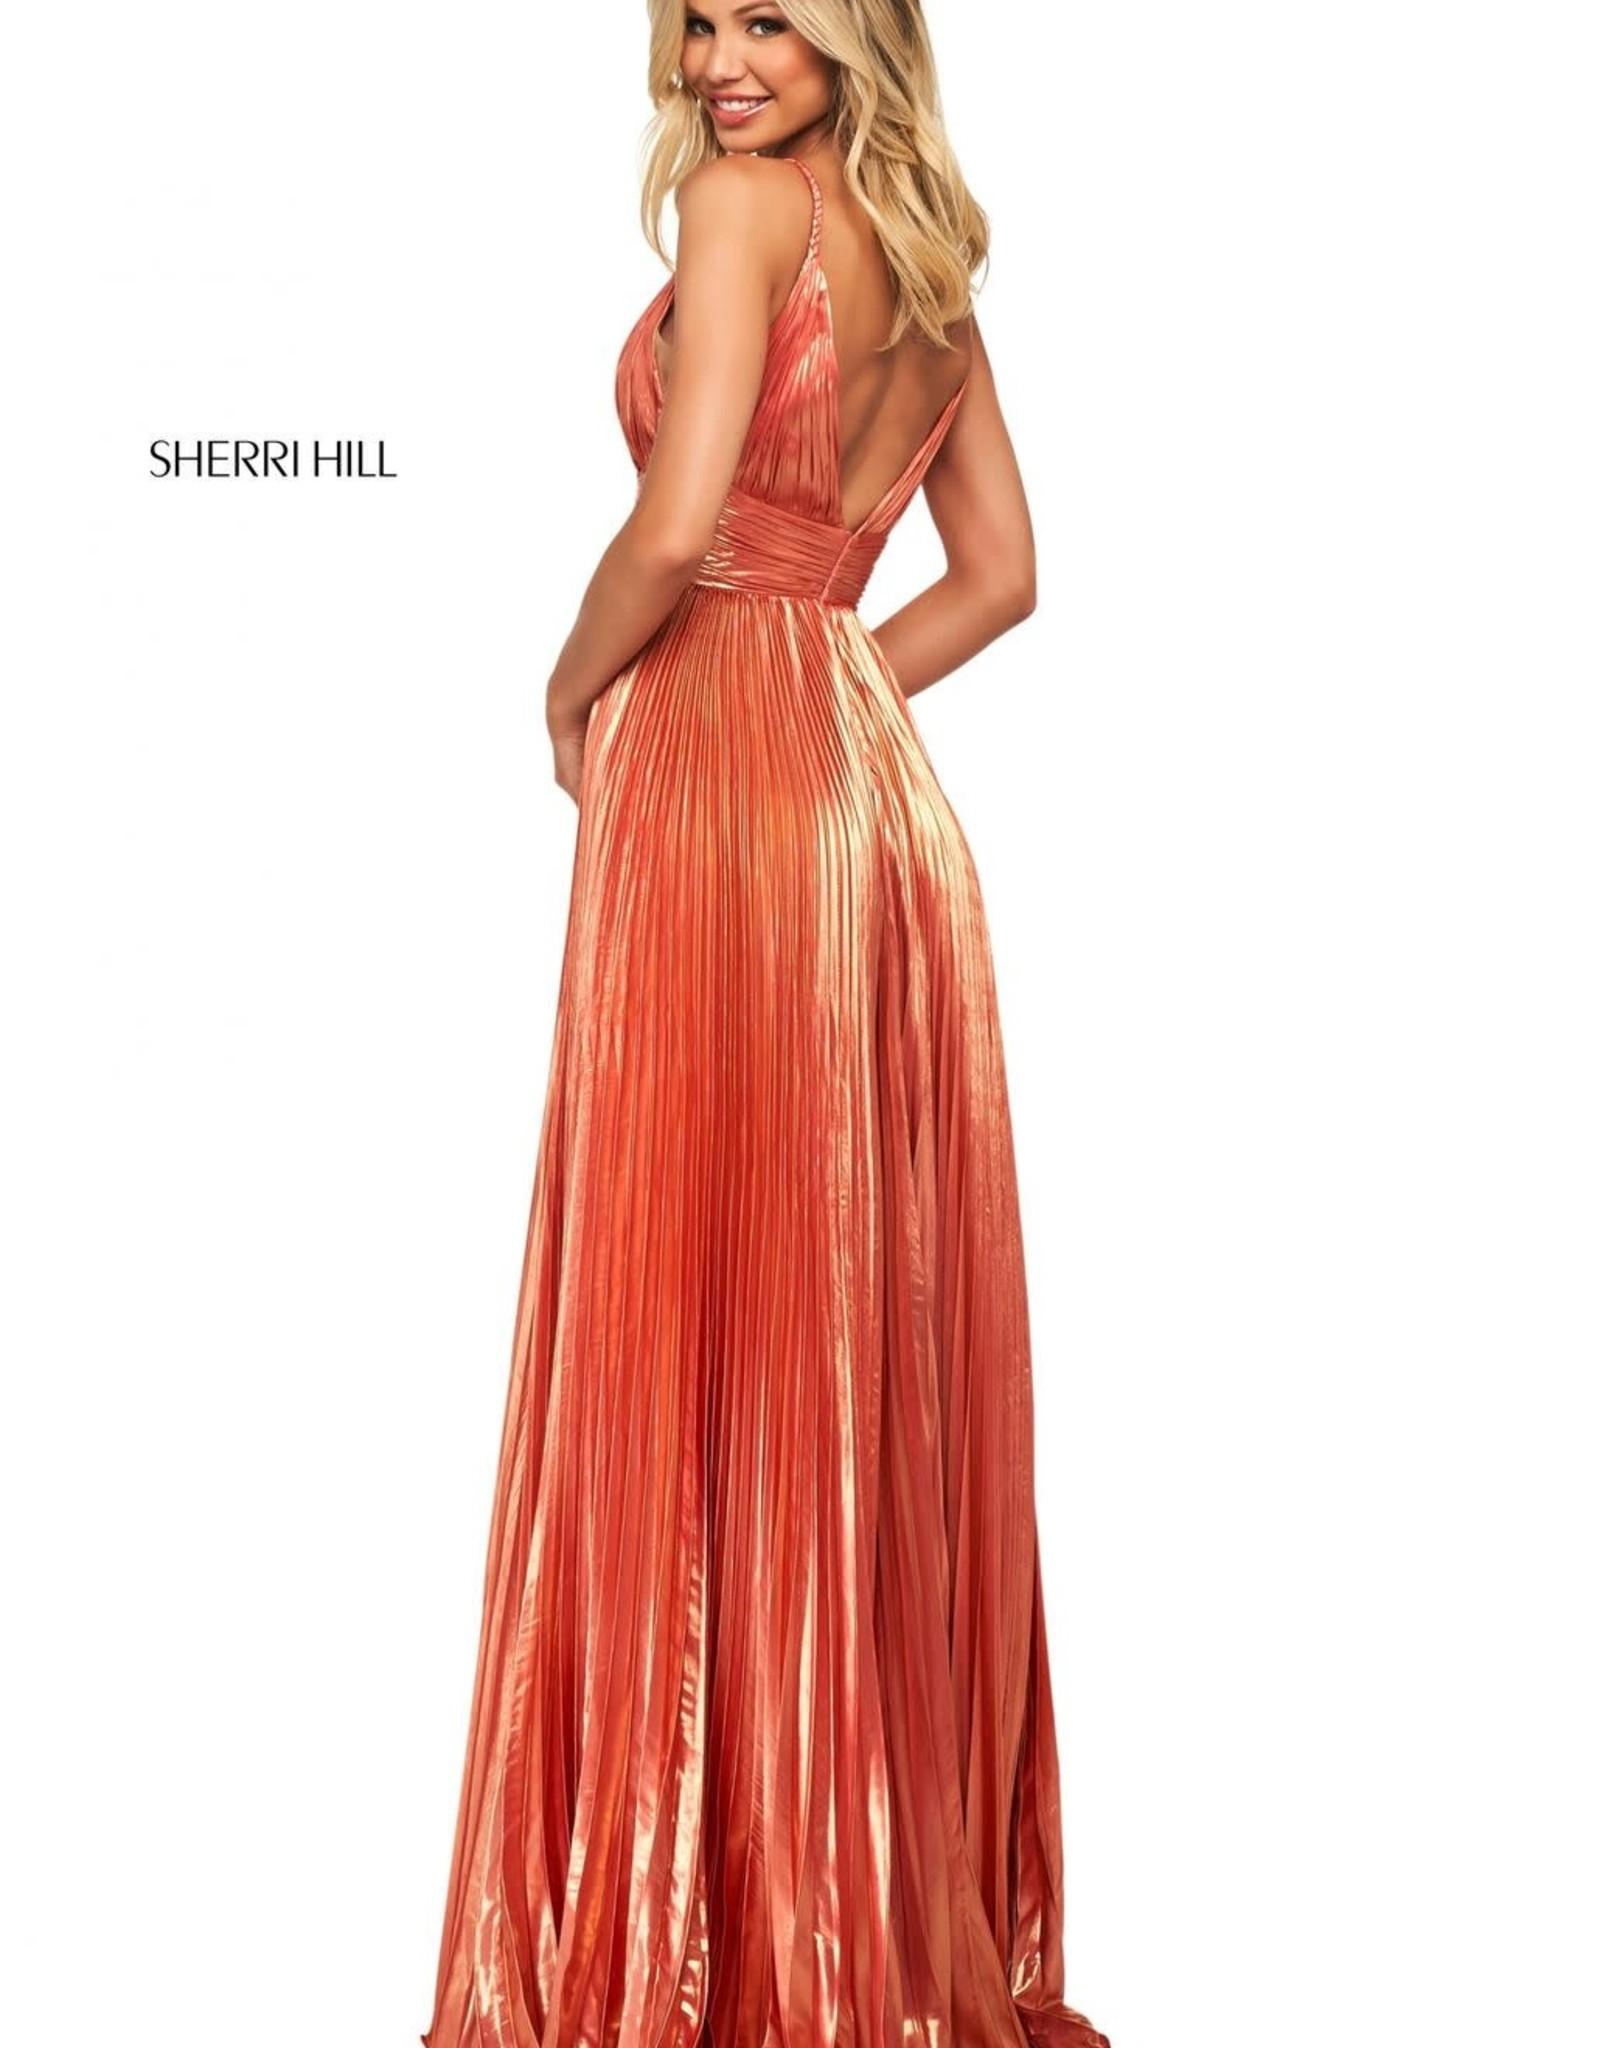 Sherri Hill Sherri Hill Coral 8